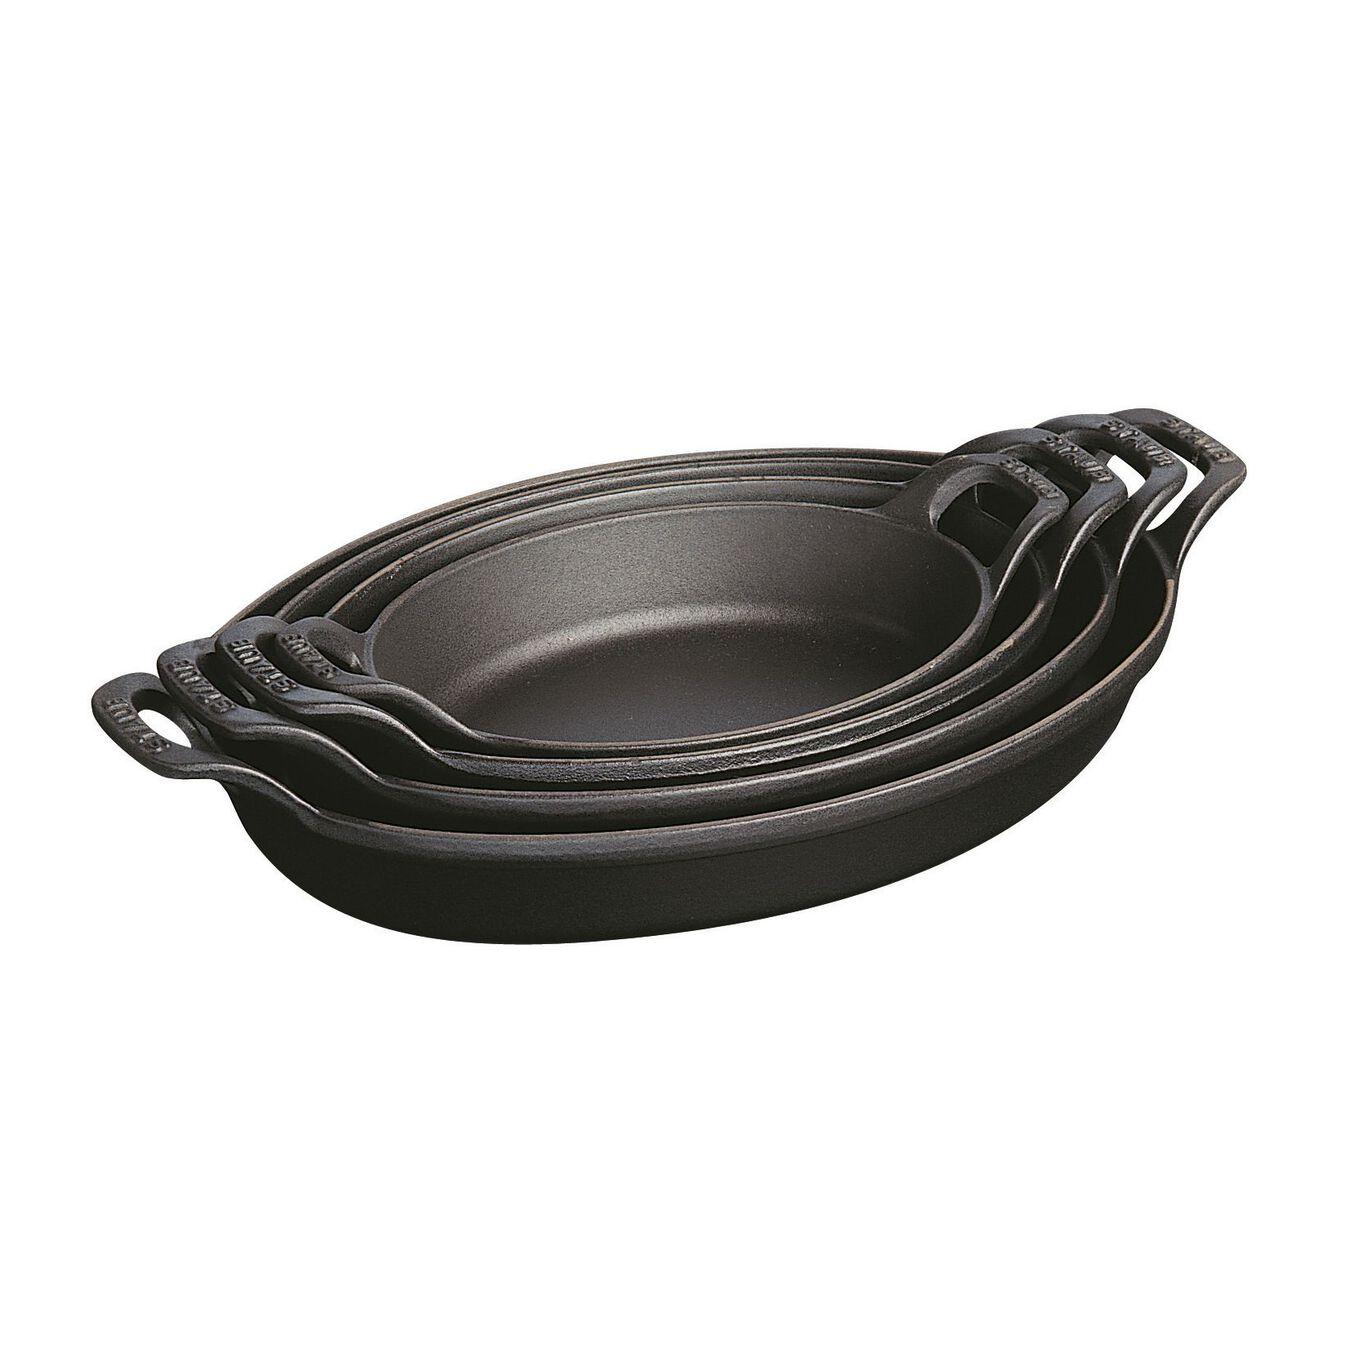 Travessa oval 21 cm x 15 cm, Ferro fundido,,large 3